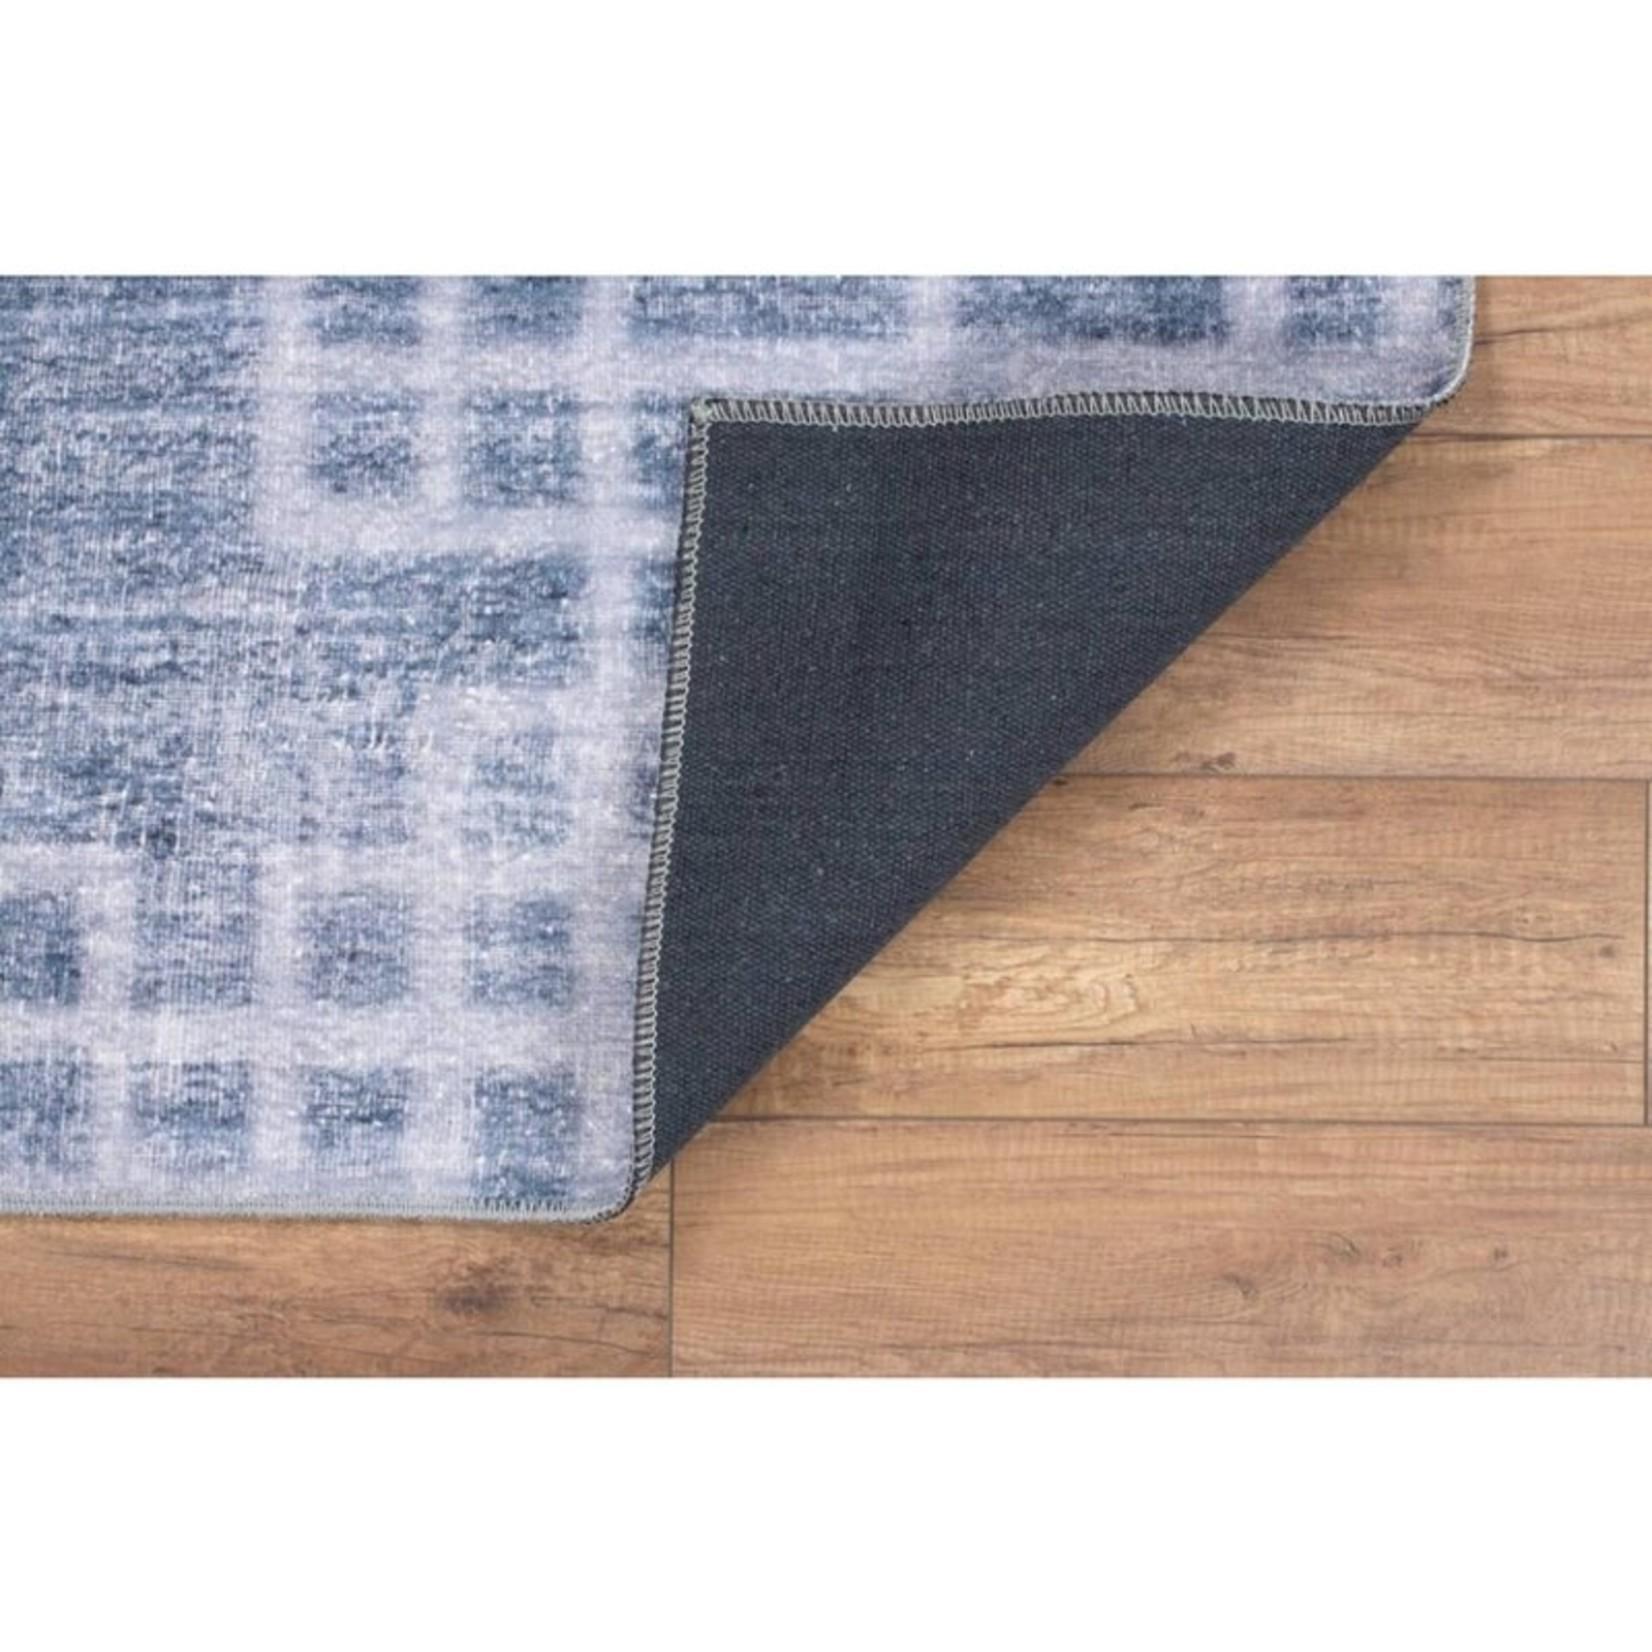 *5' x 7' - Artloop AL 231 Non-Slip Cotton/Microfiber Area Rug-Rectangle